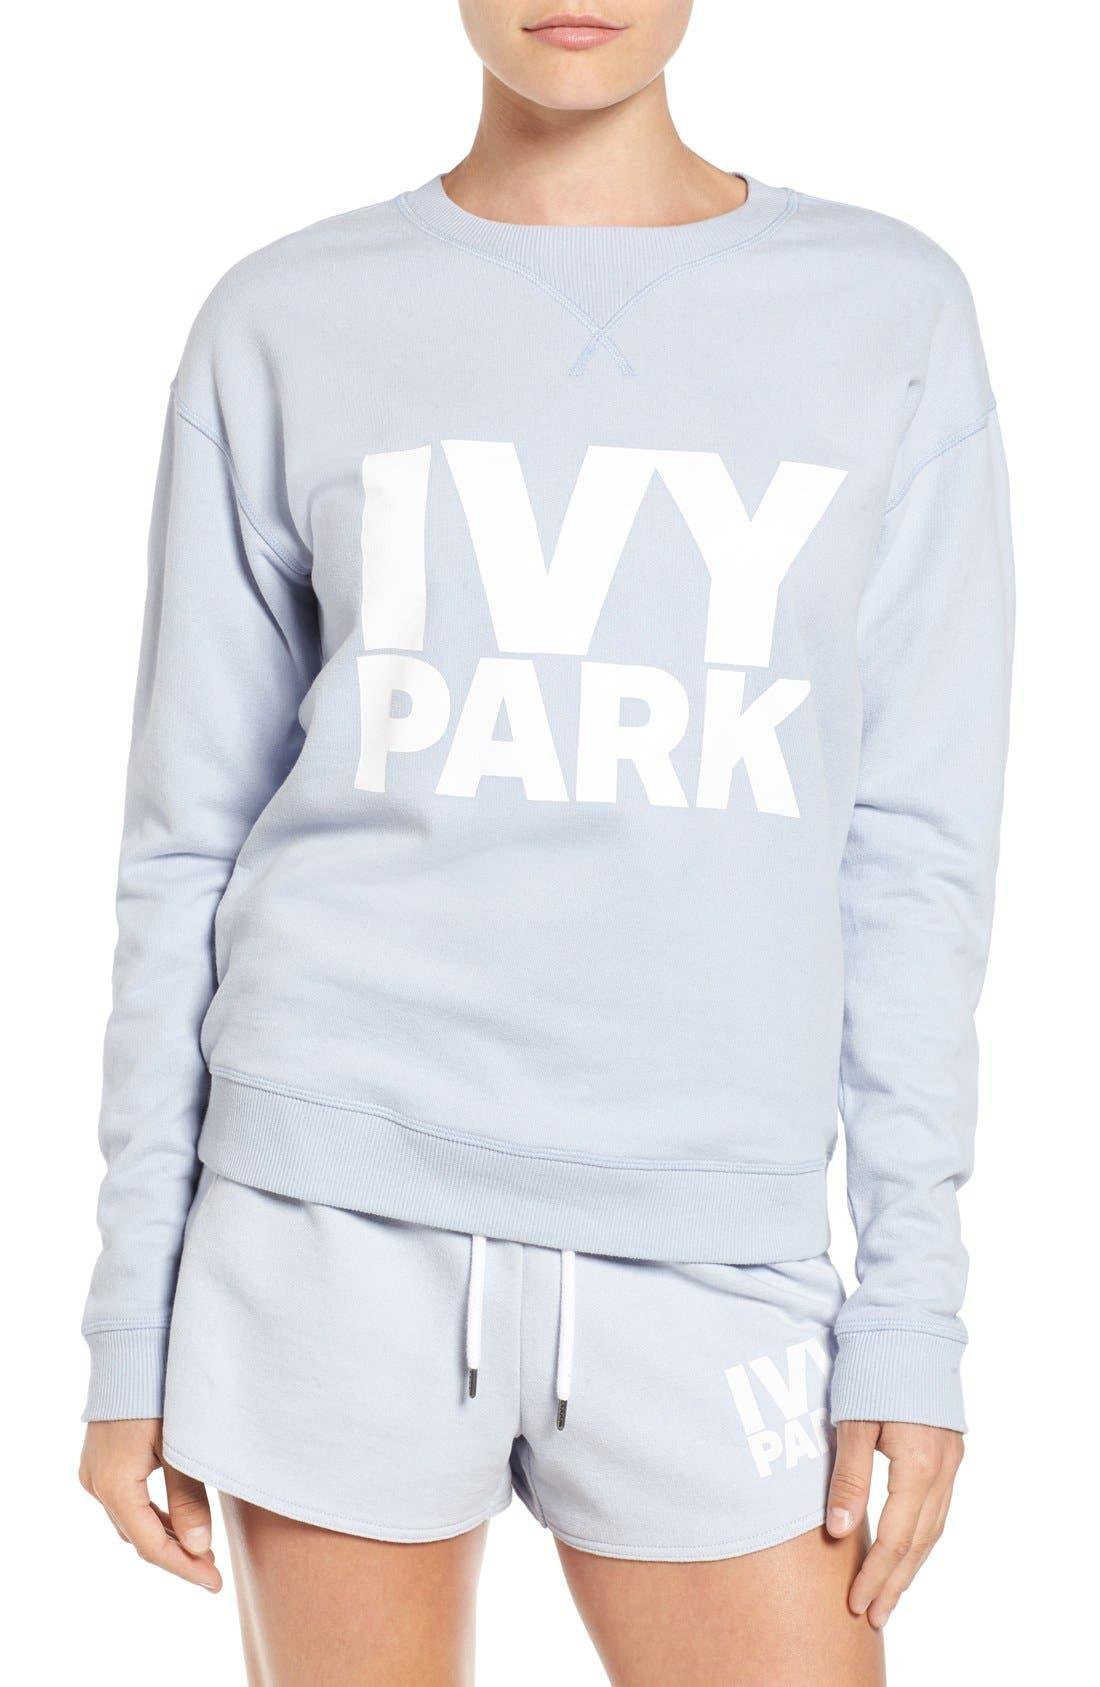 Main Image - IVY PARK® Logo Peached Sweatshirt